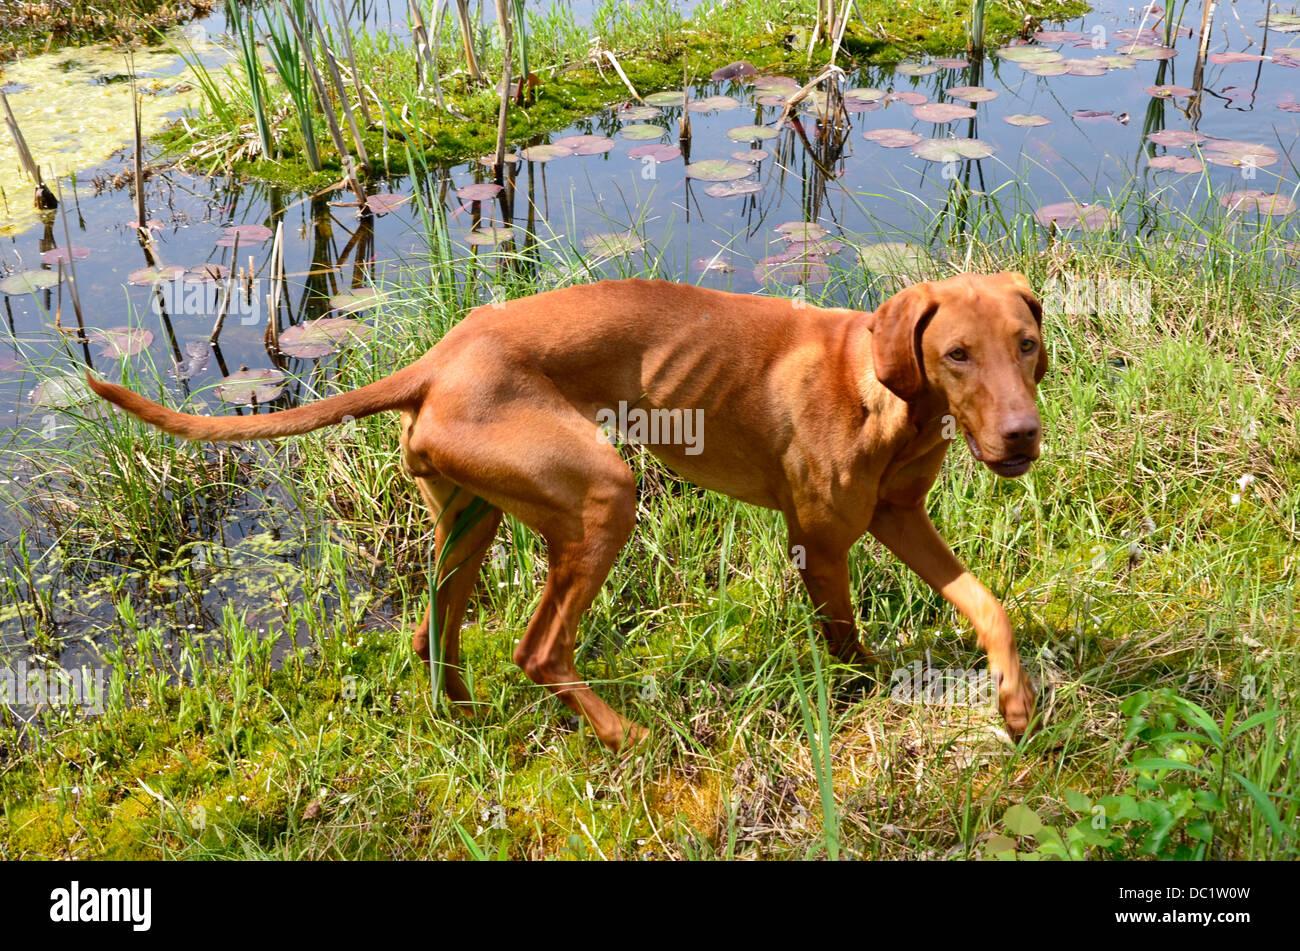 Hungarian Vizsla Dog Magyar Vizsla, Vizsla Gundog shorthaired - Stock Image